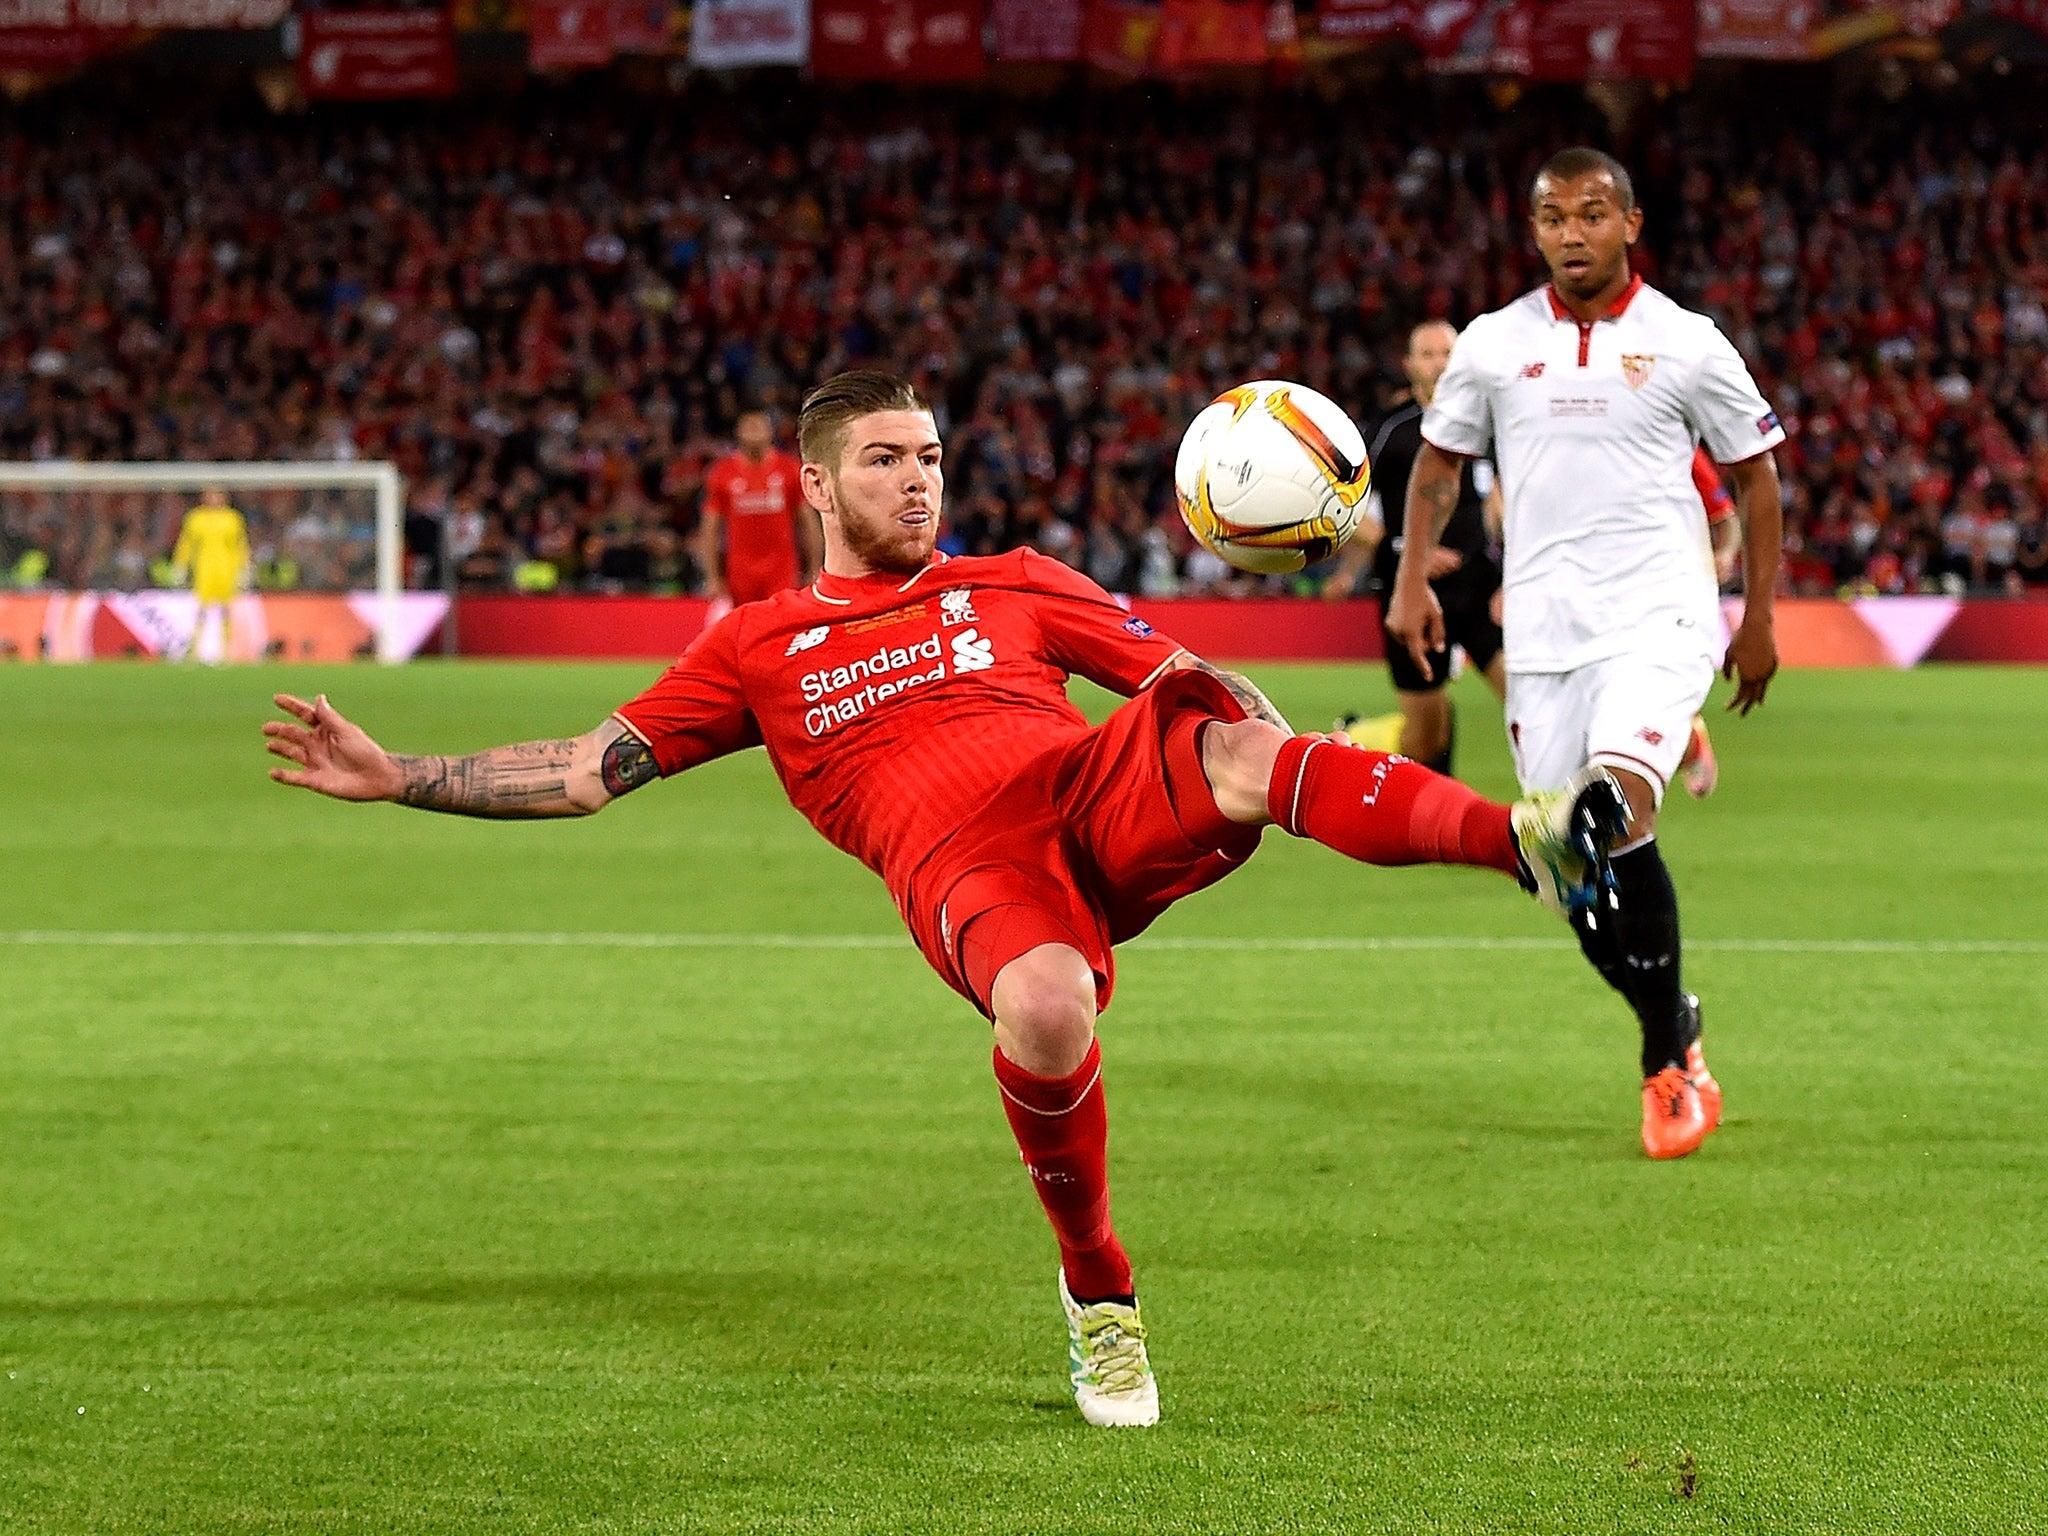 Liverpool boss Jurgen Klopp the 'unluckiest' manager in